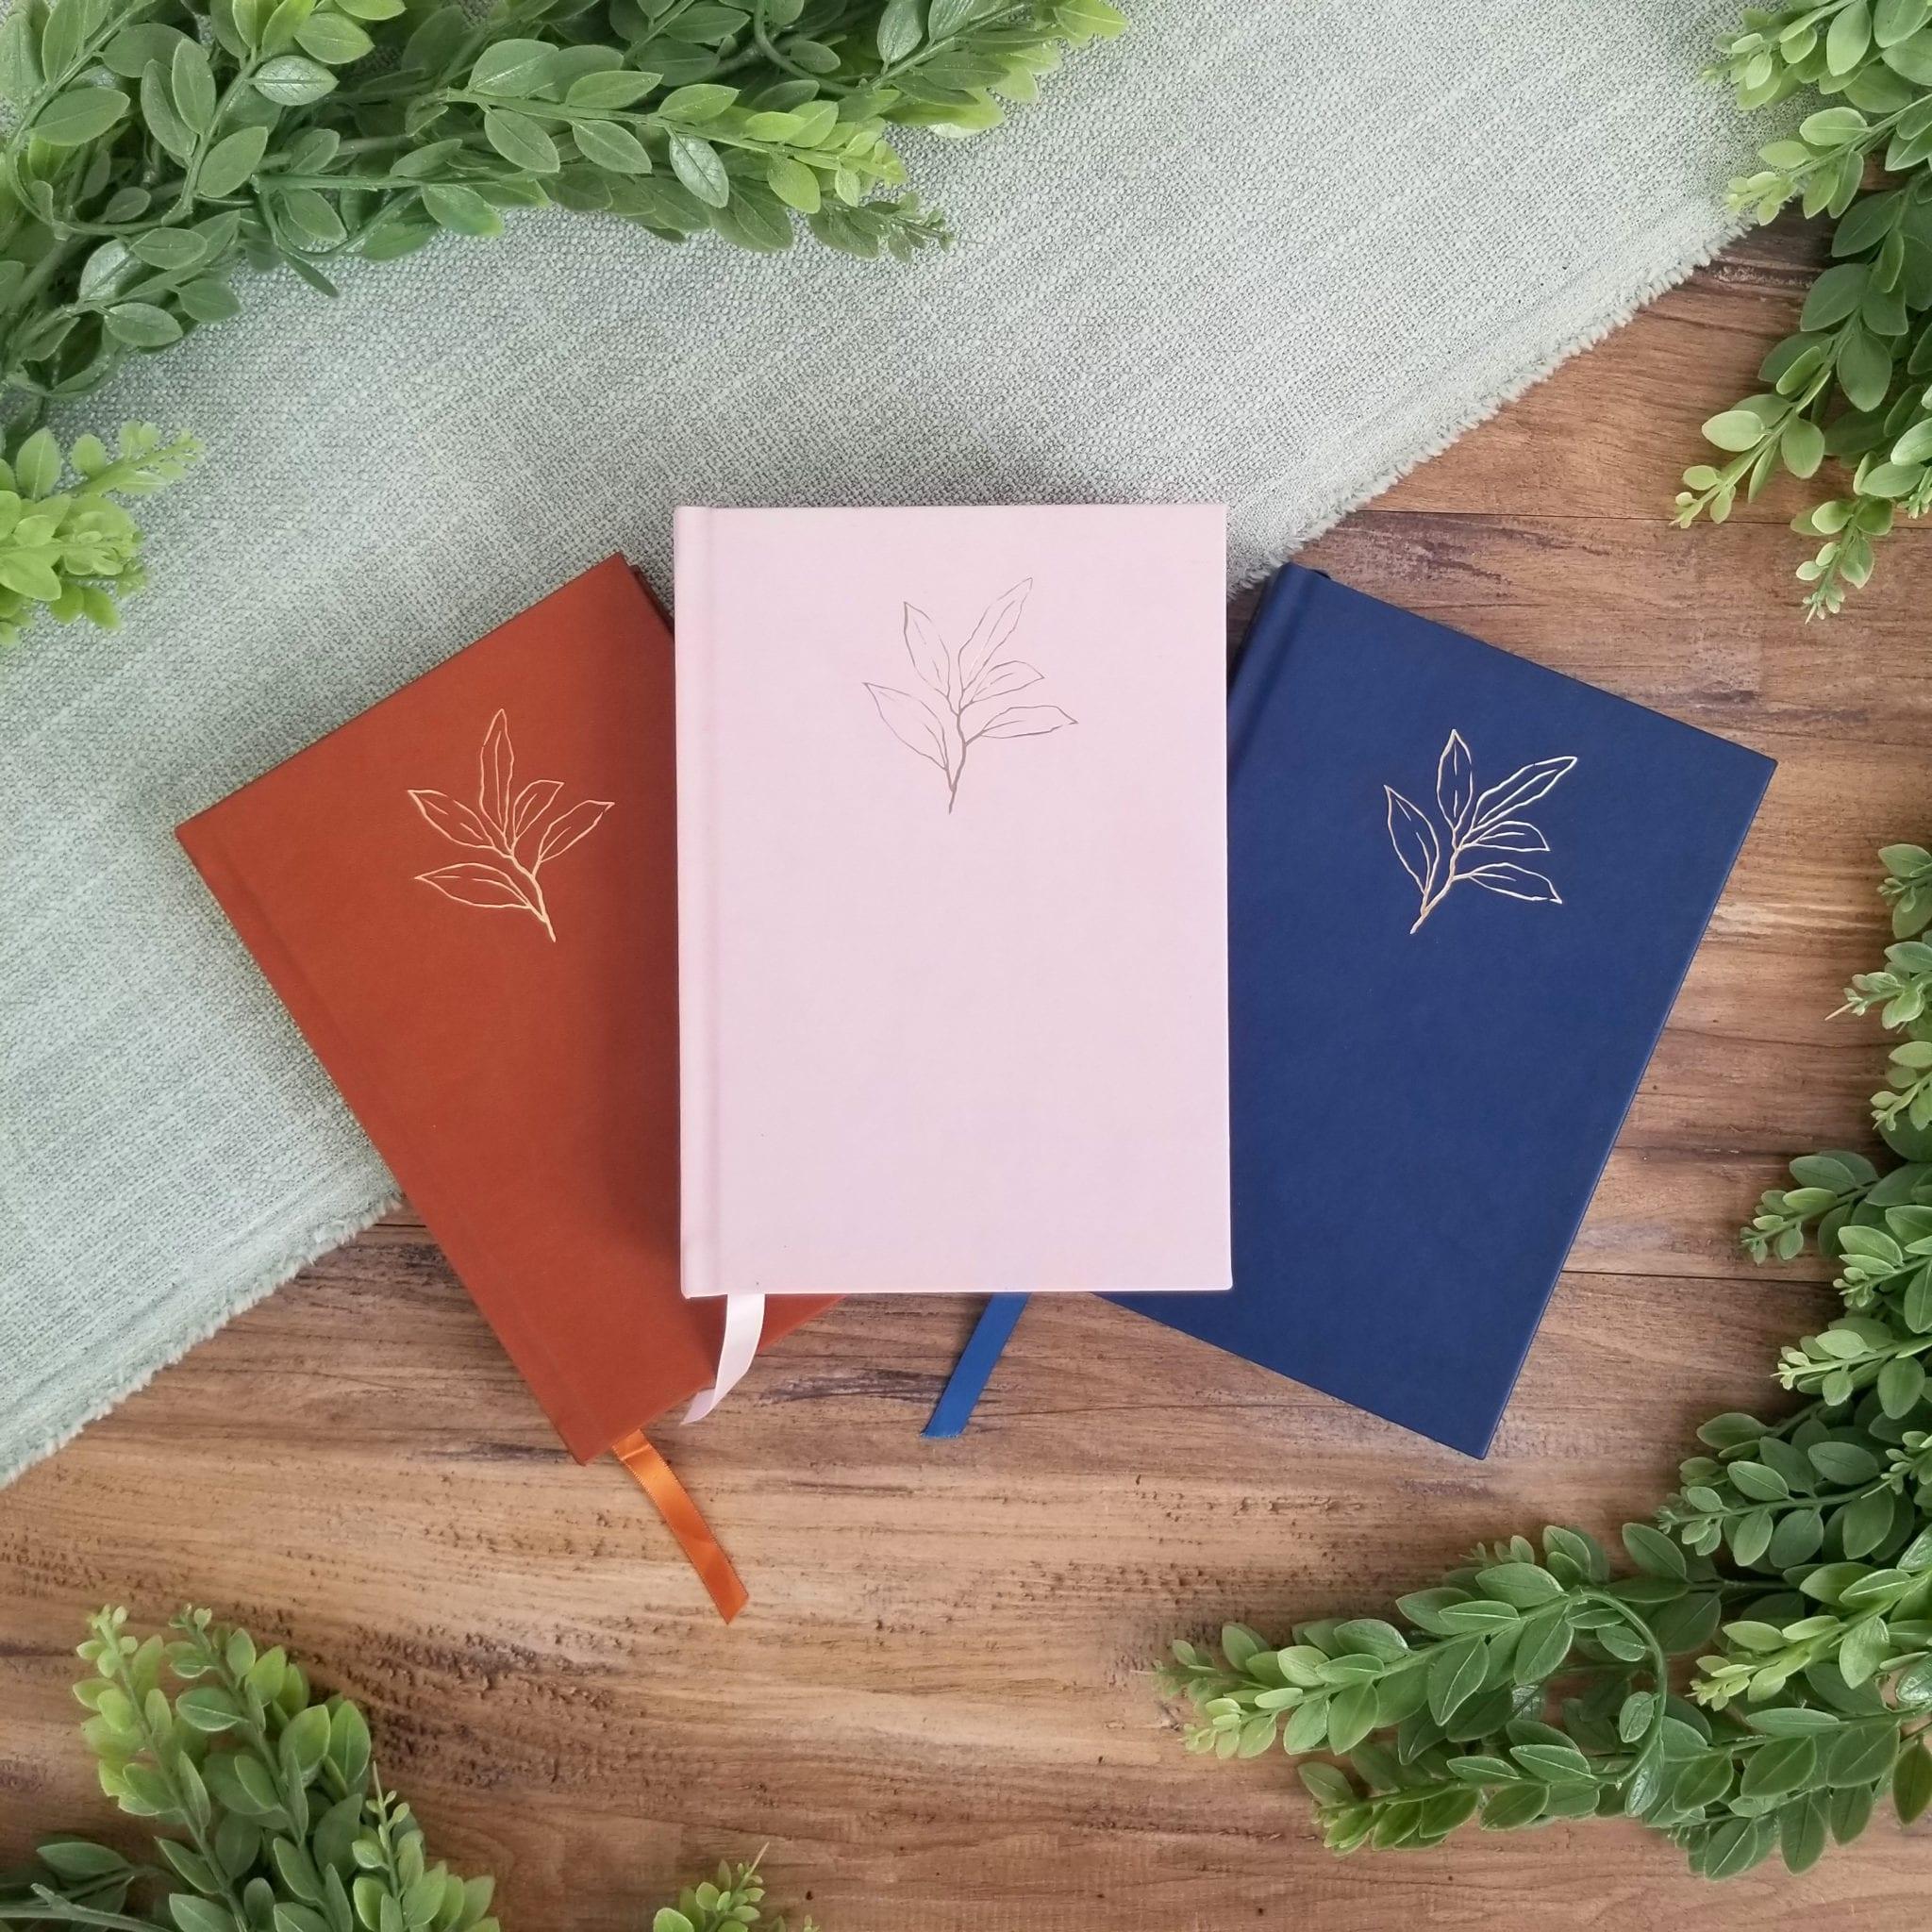 all 3 journals